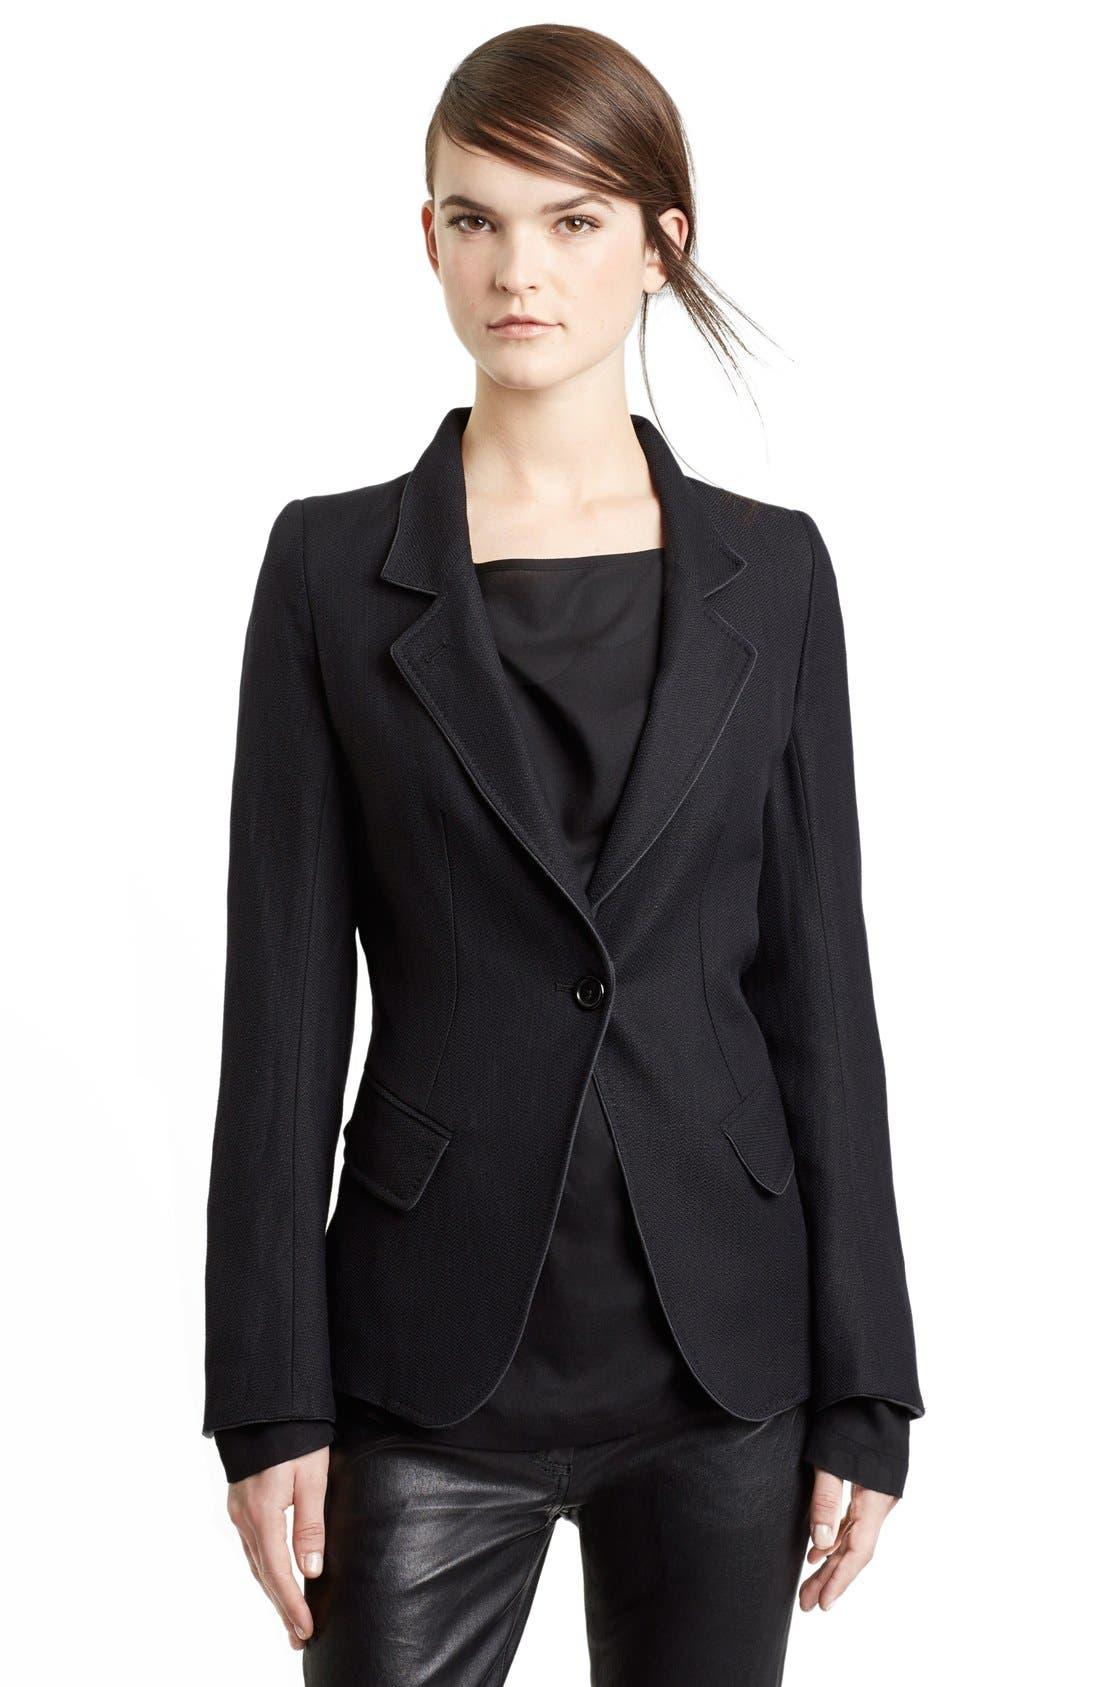 Alternate Image 1 Selected - Ann Demeulemeester Wool & Linen One-Button Jacket